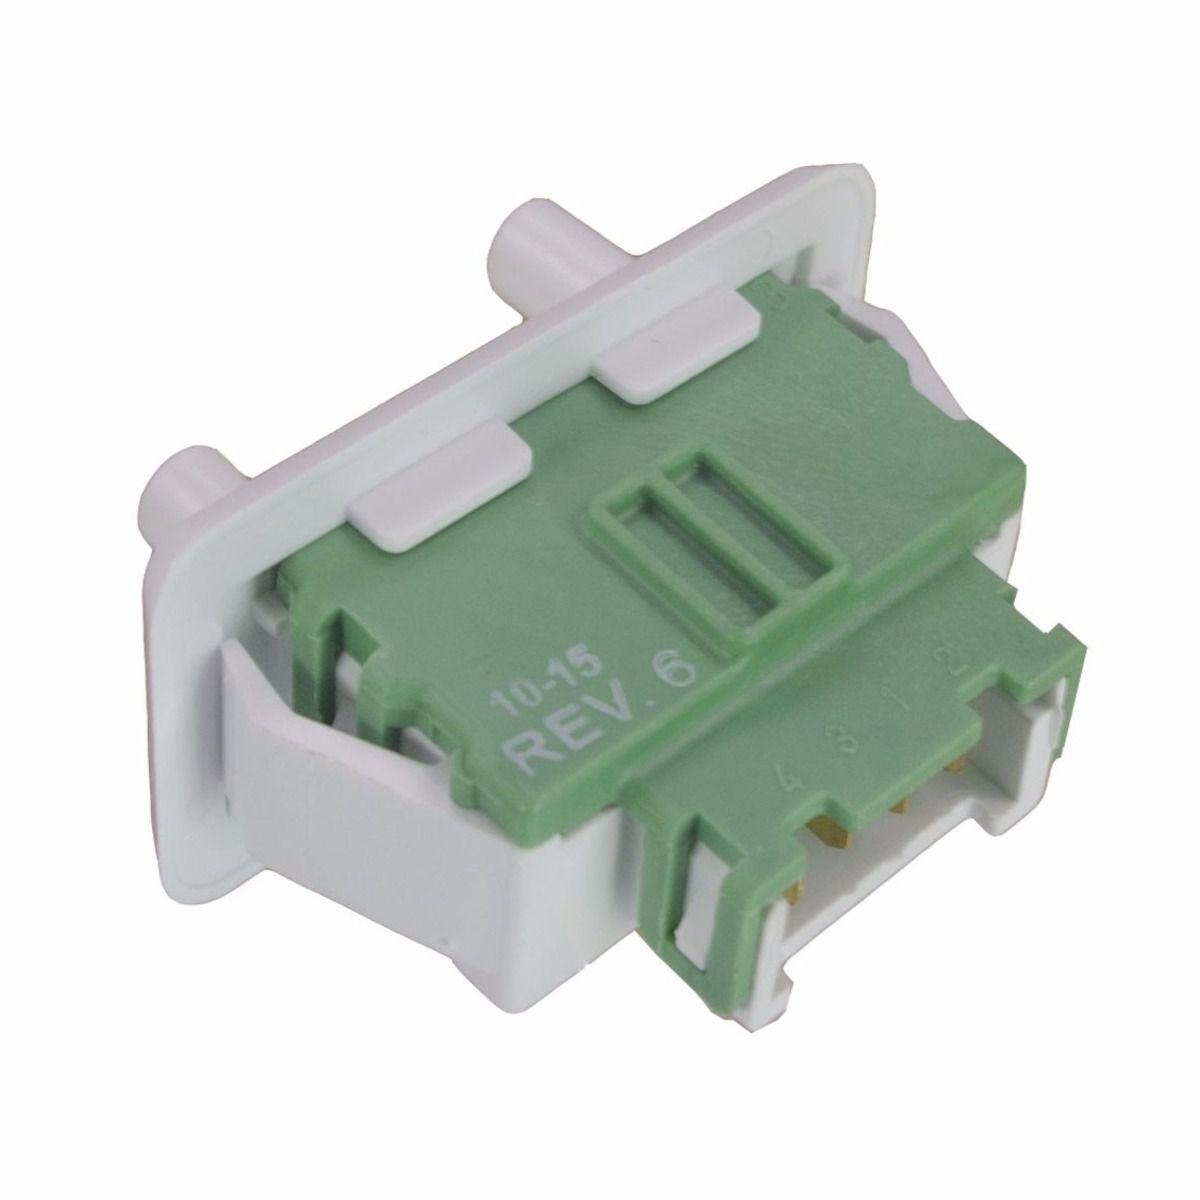 Interruptor Porta de Geladeira DF 34/38 Duplo Electrolux